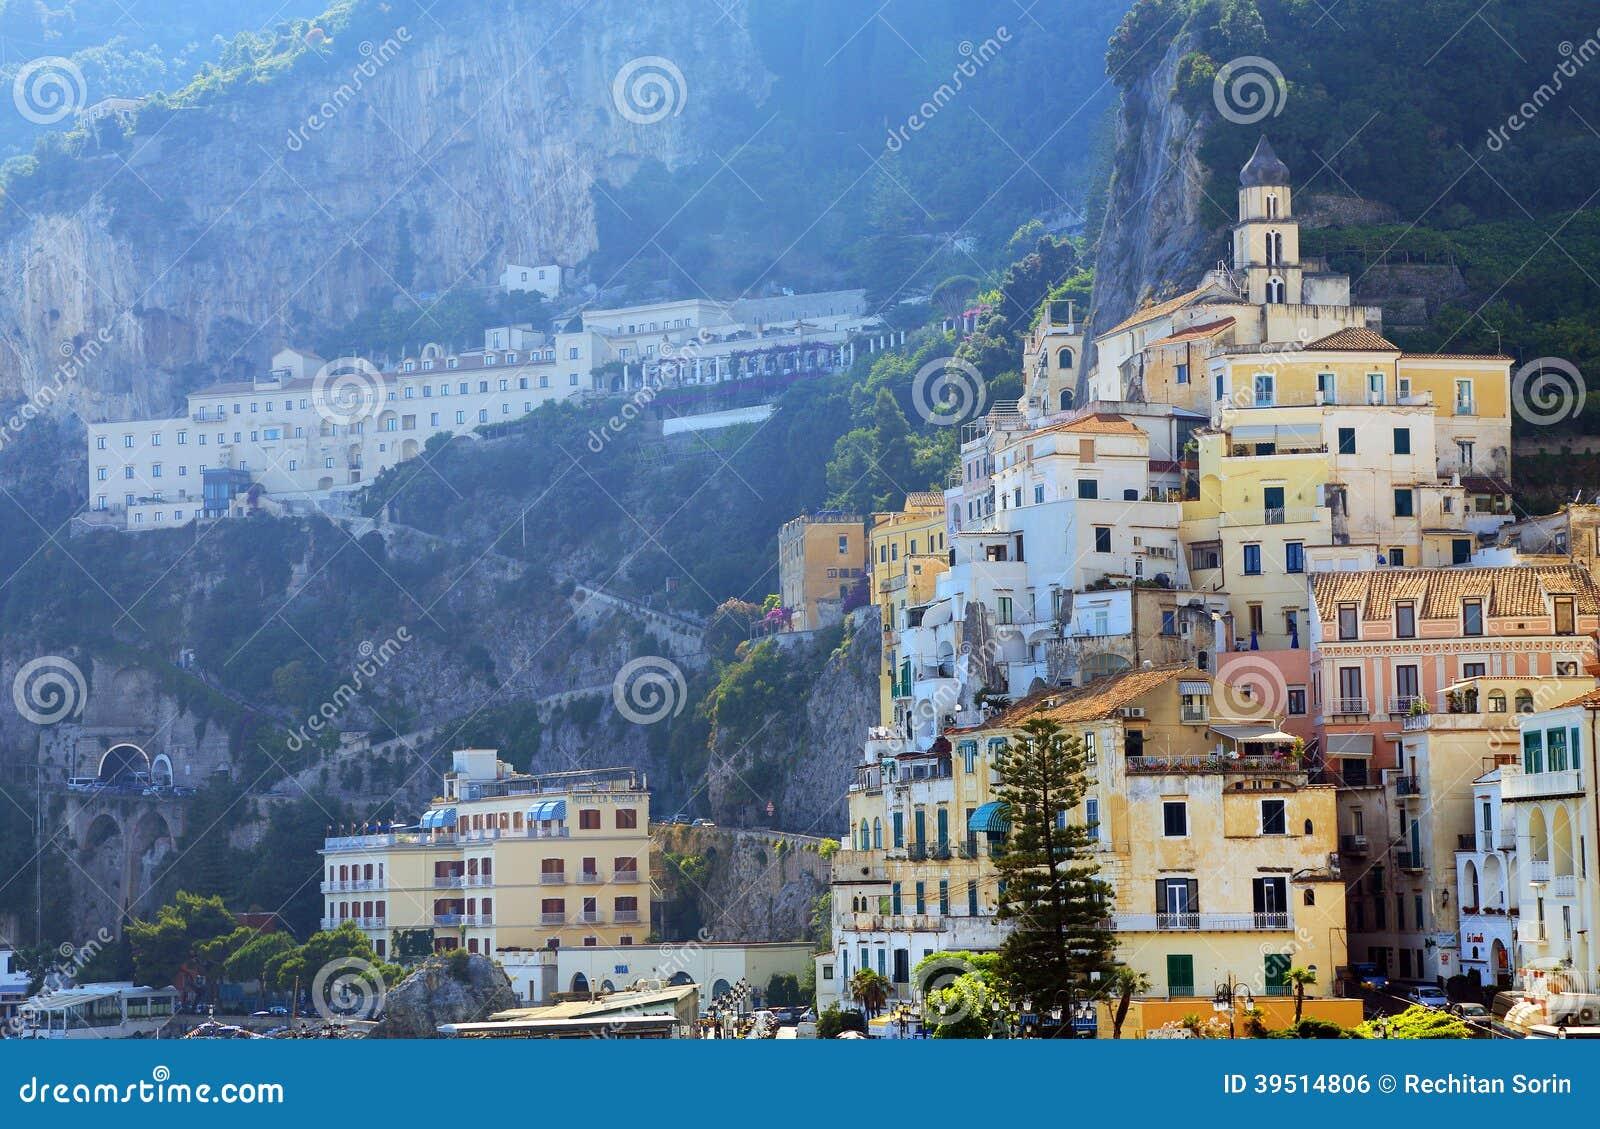 Awesome Soggiorno Amalfi Photos - Idee Arredamento Casa & Interior ...